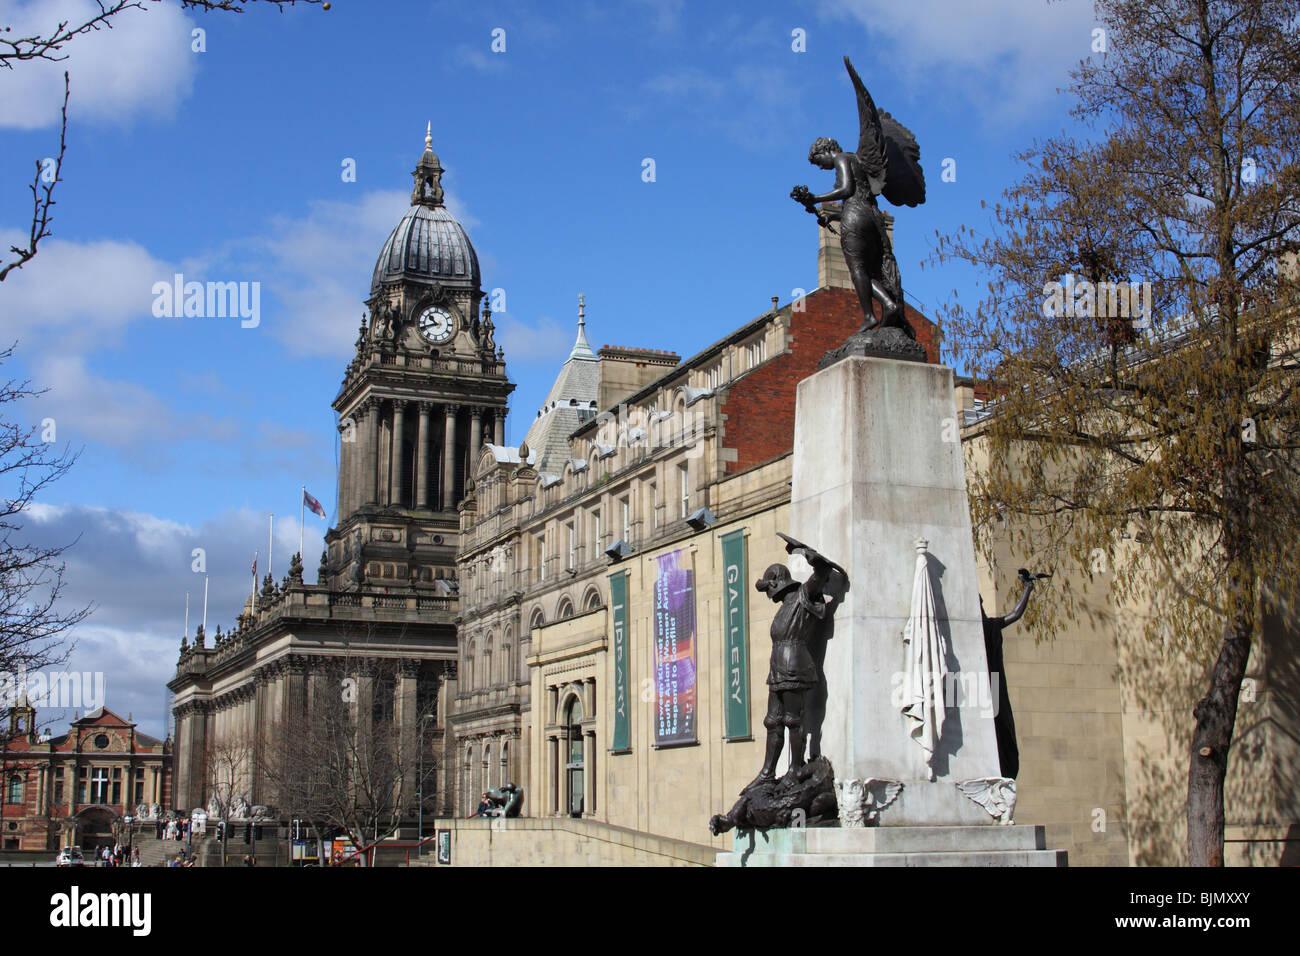 Leeds Town Hall, Leeds, England, U.K. - Stock Image